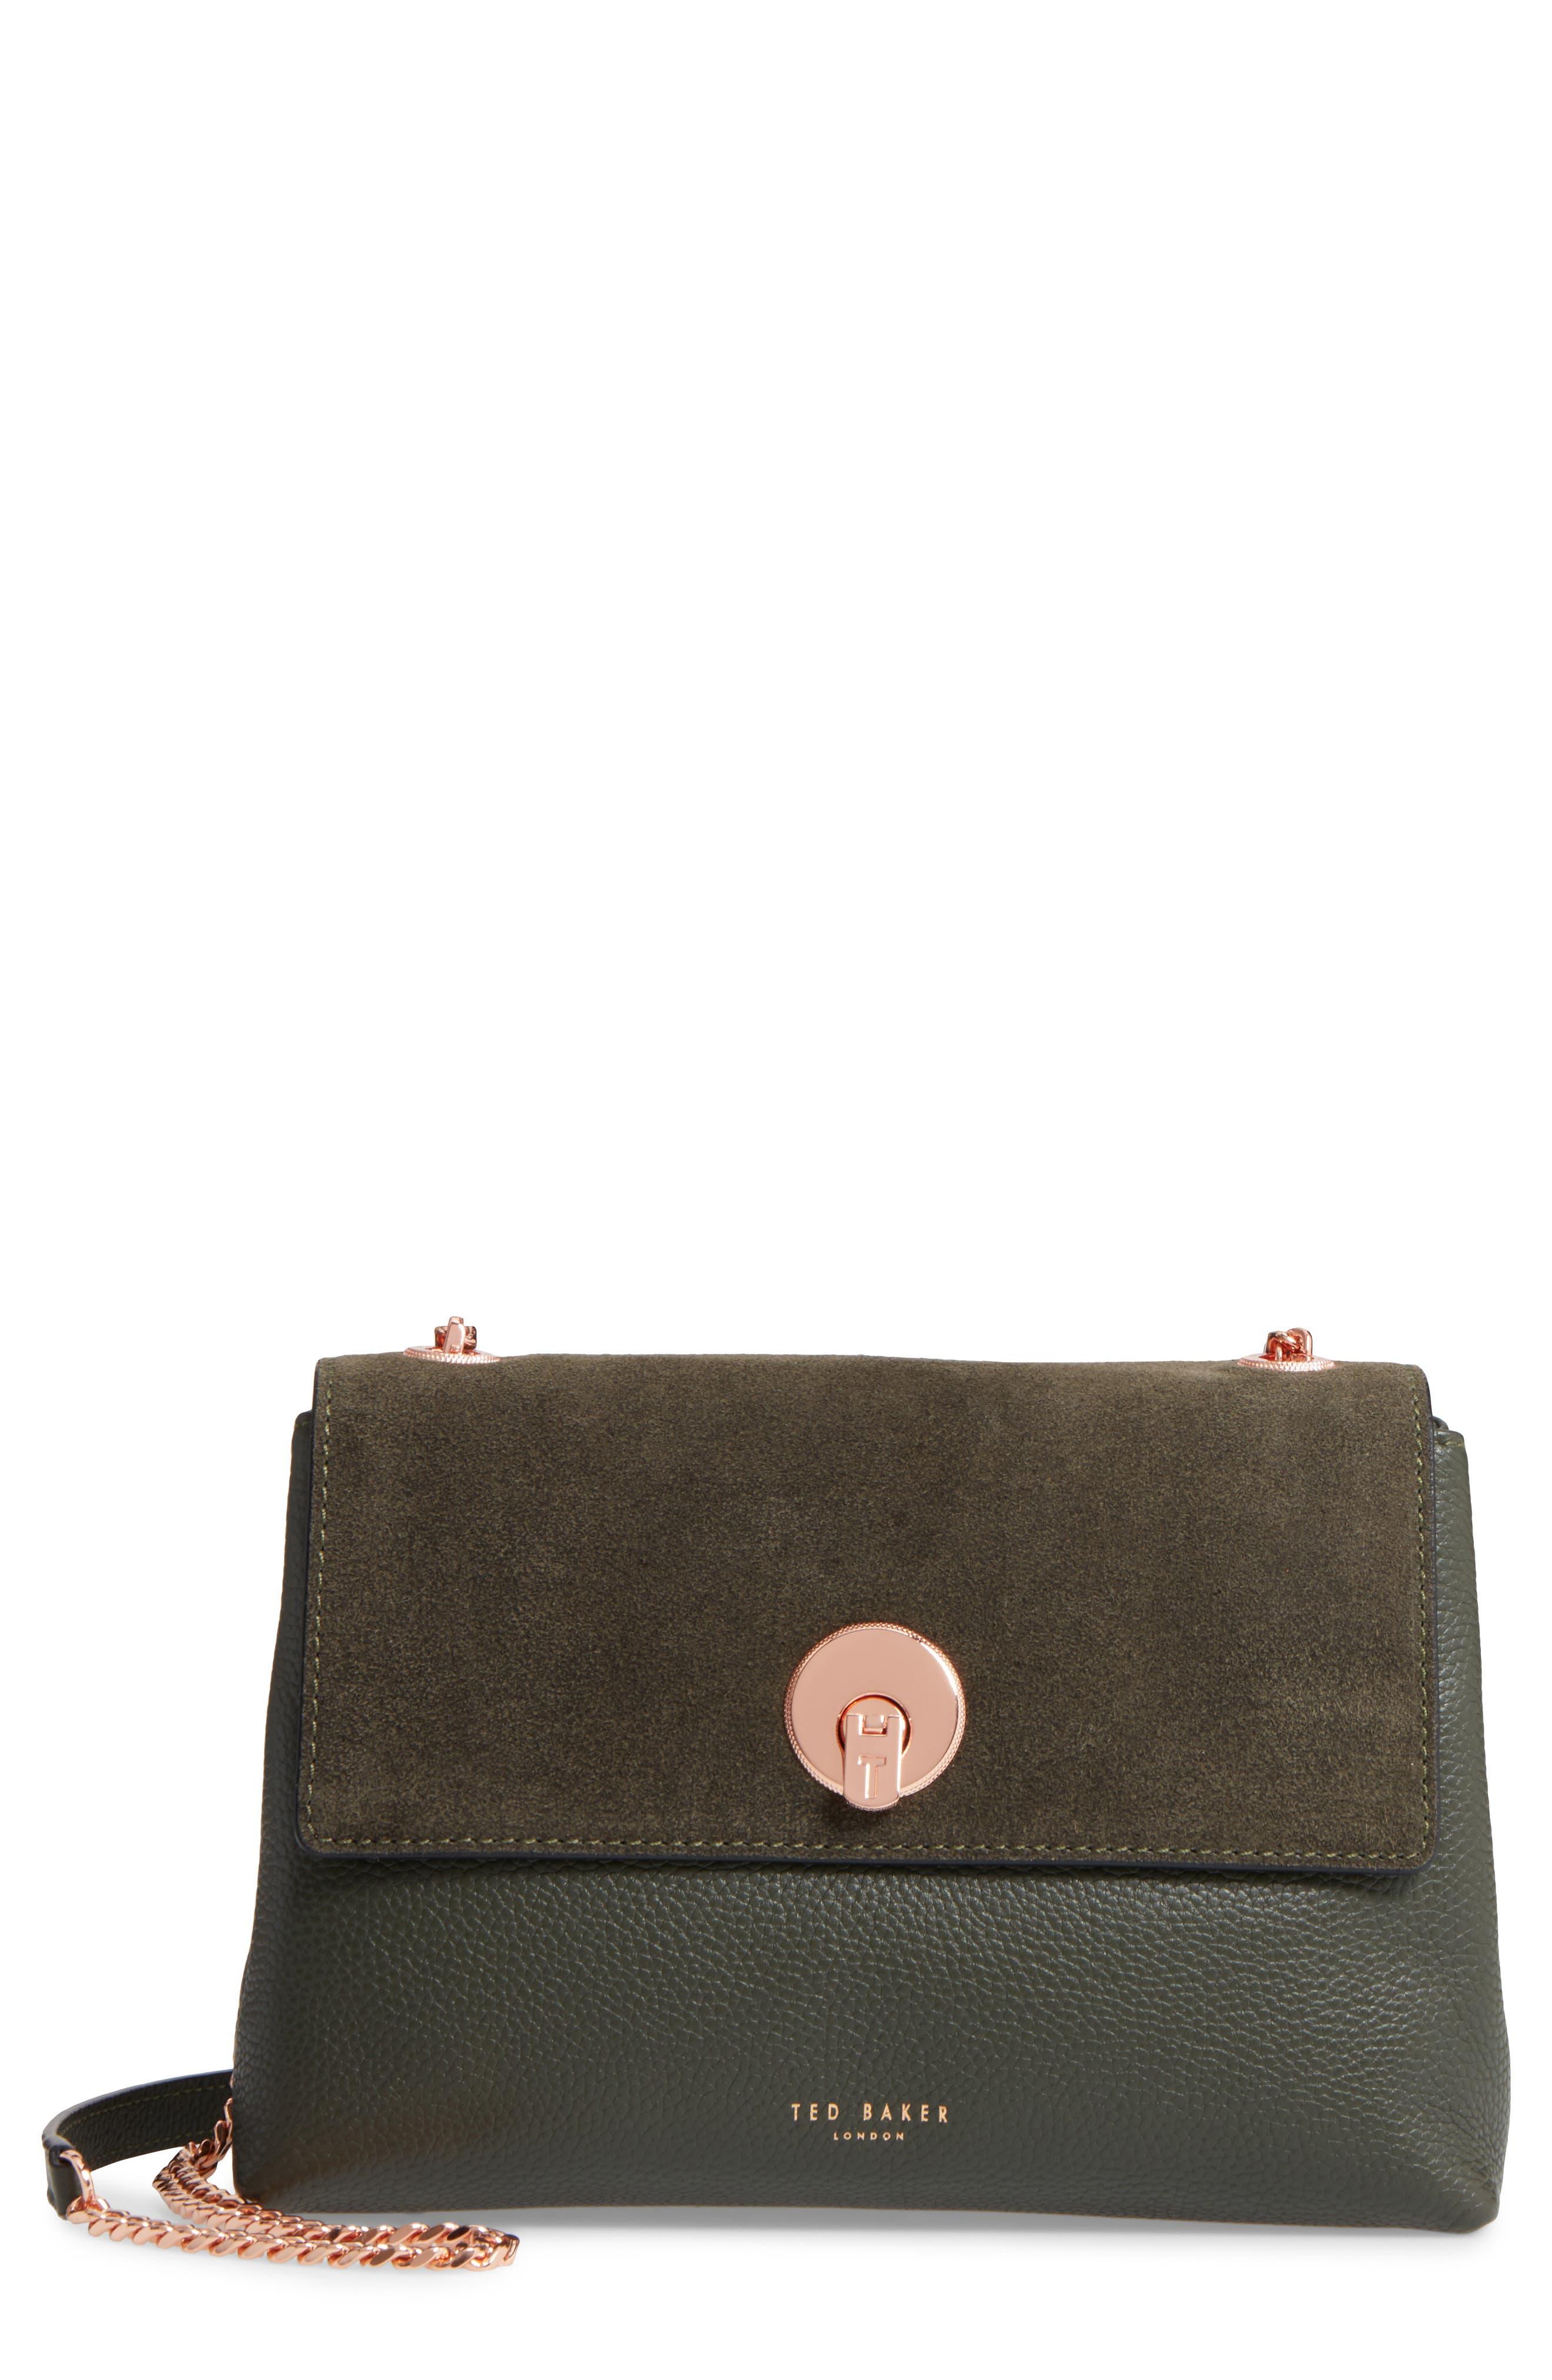 Ted Baker London Sorikai Leather & Suede Crossbody Bag